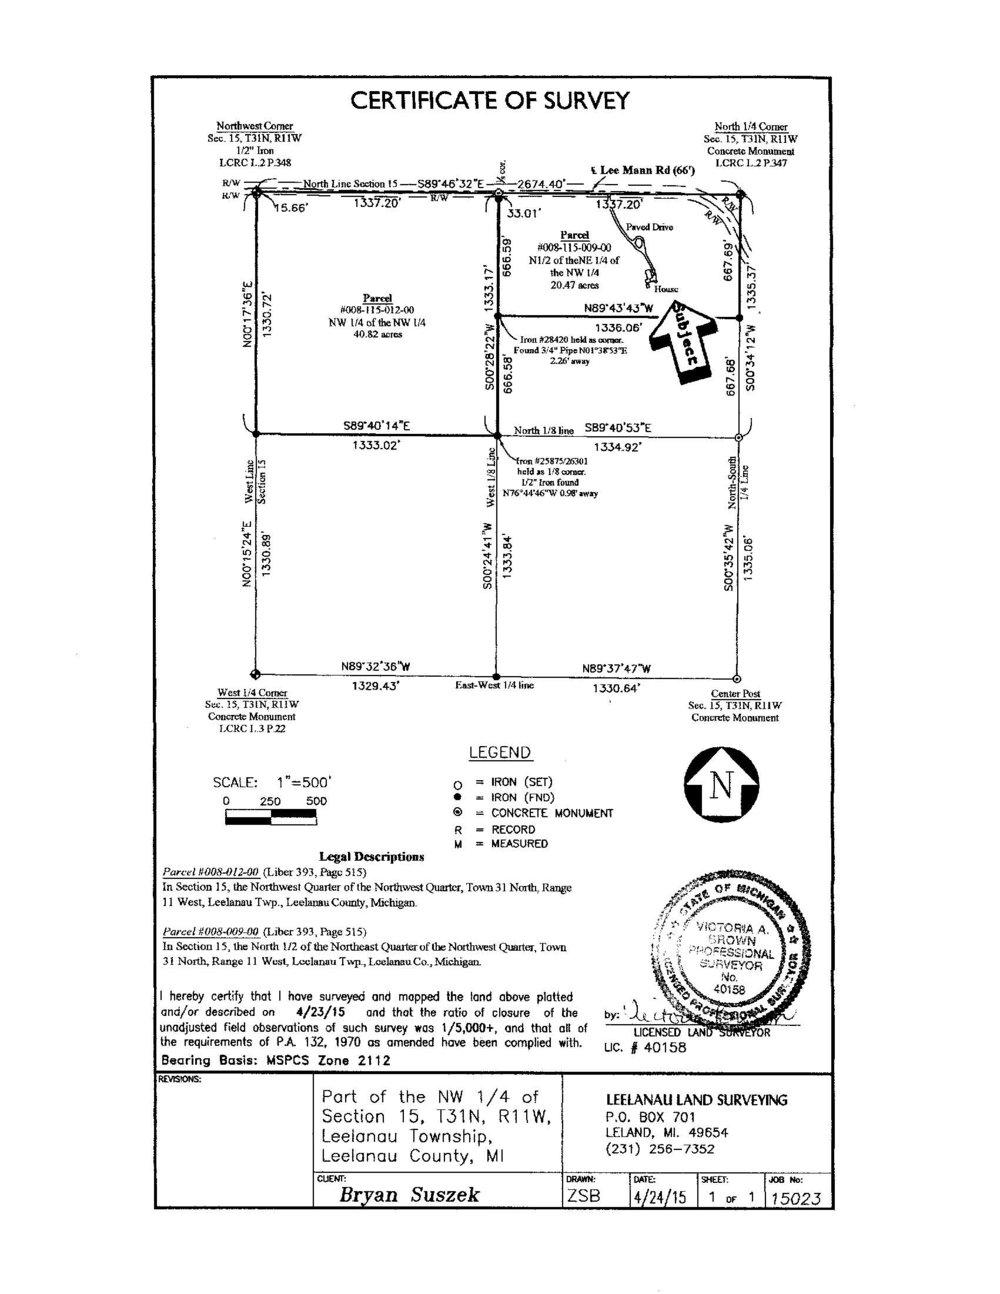 11140 E Lee Mann Road Marketing Packet_Page_09.jpg